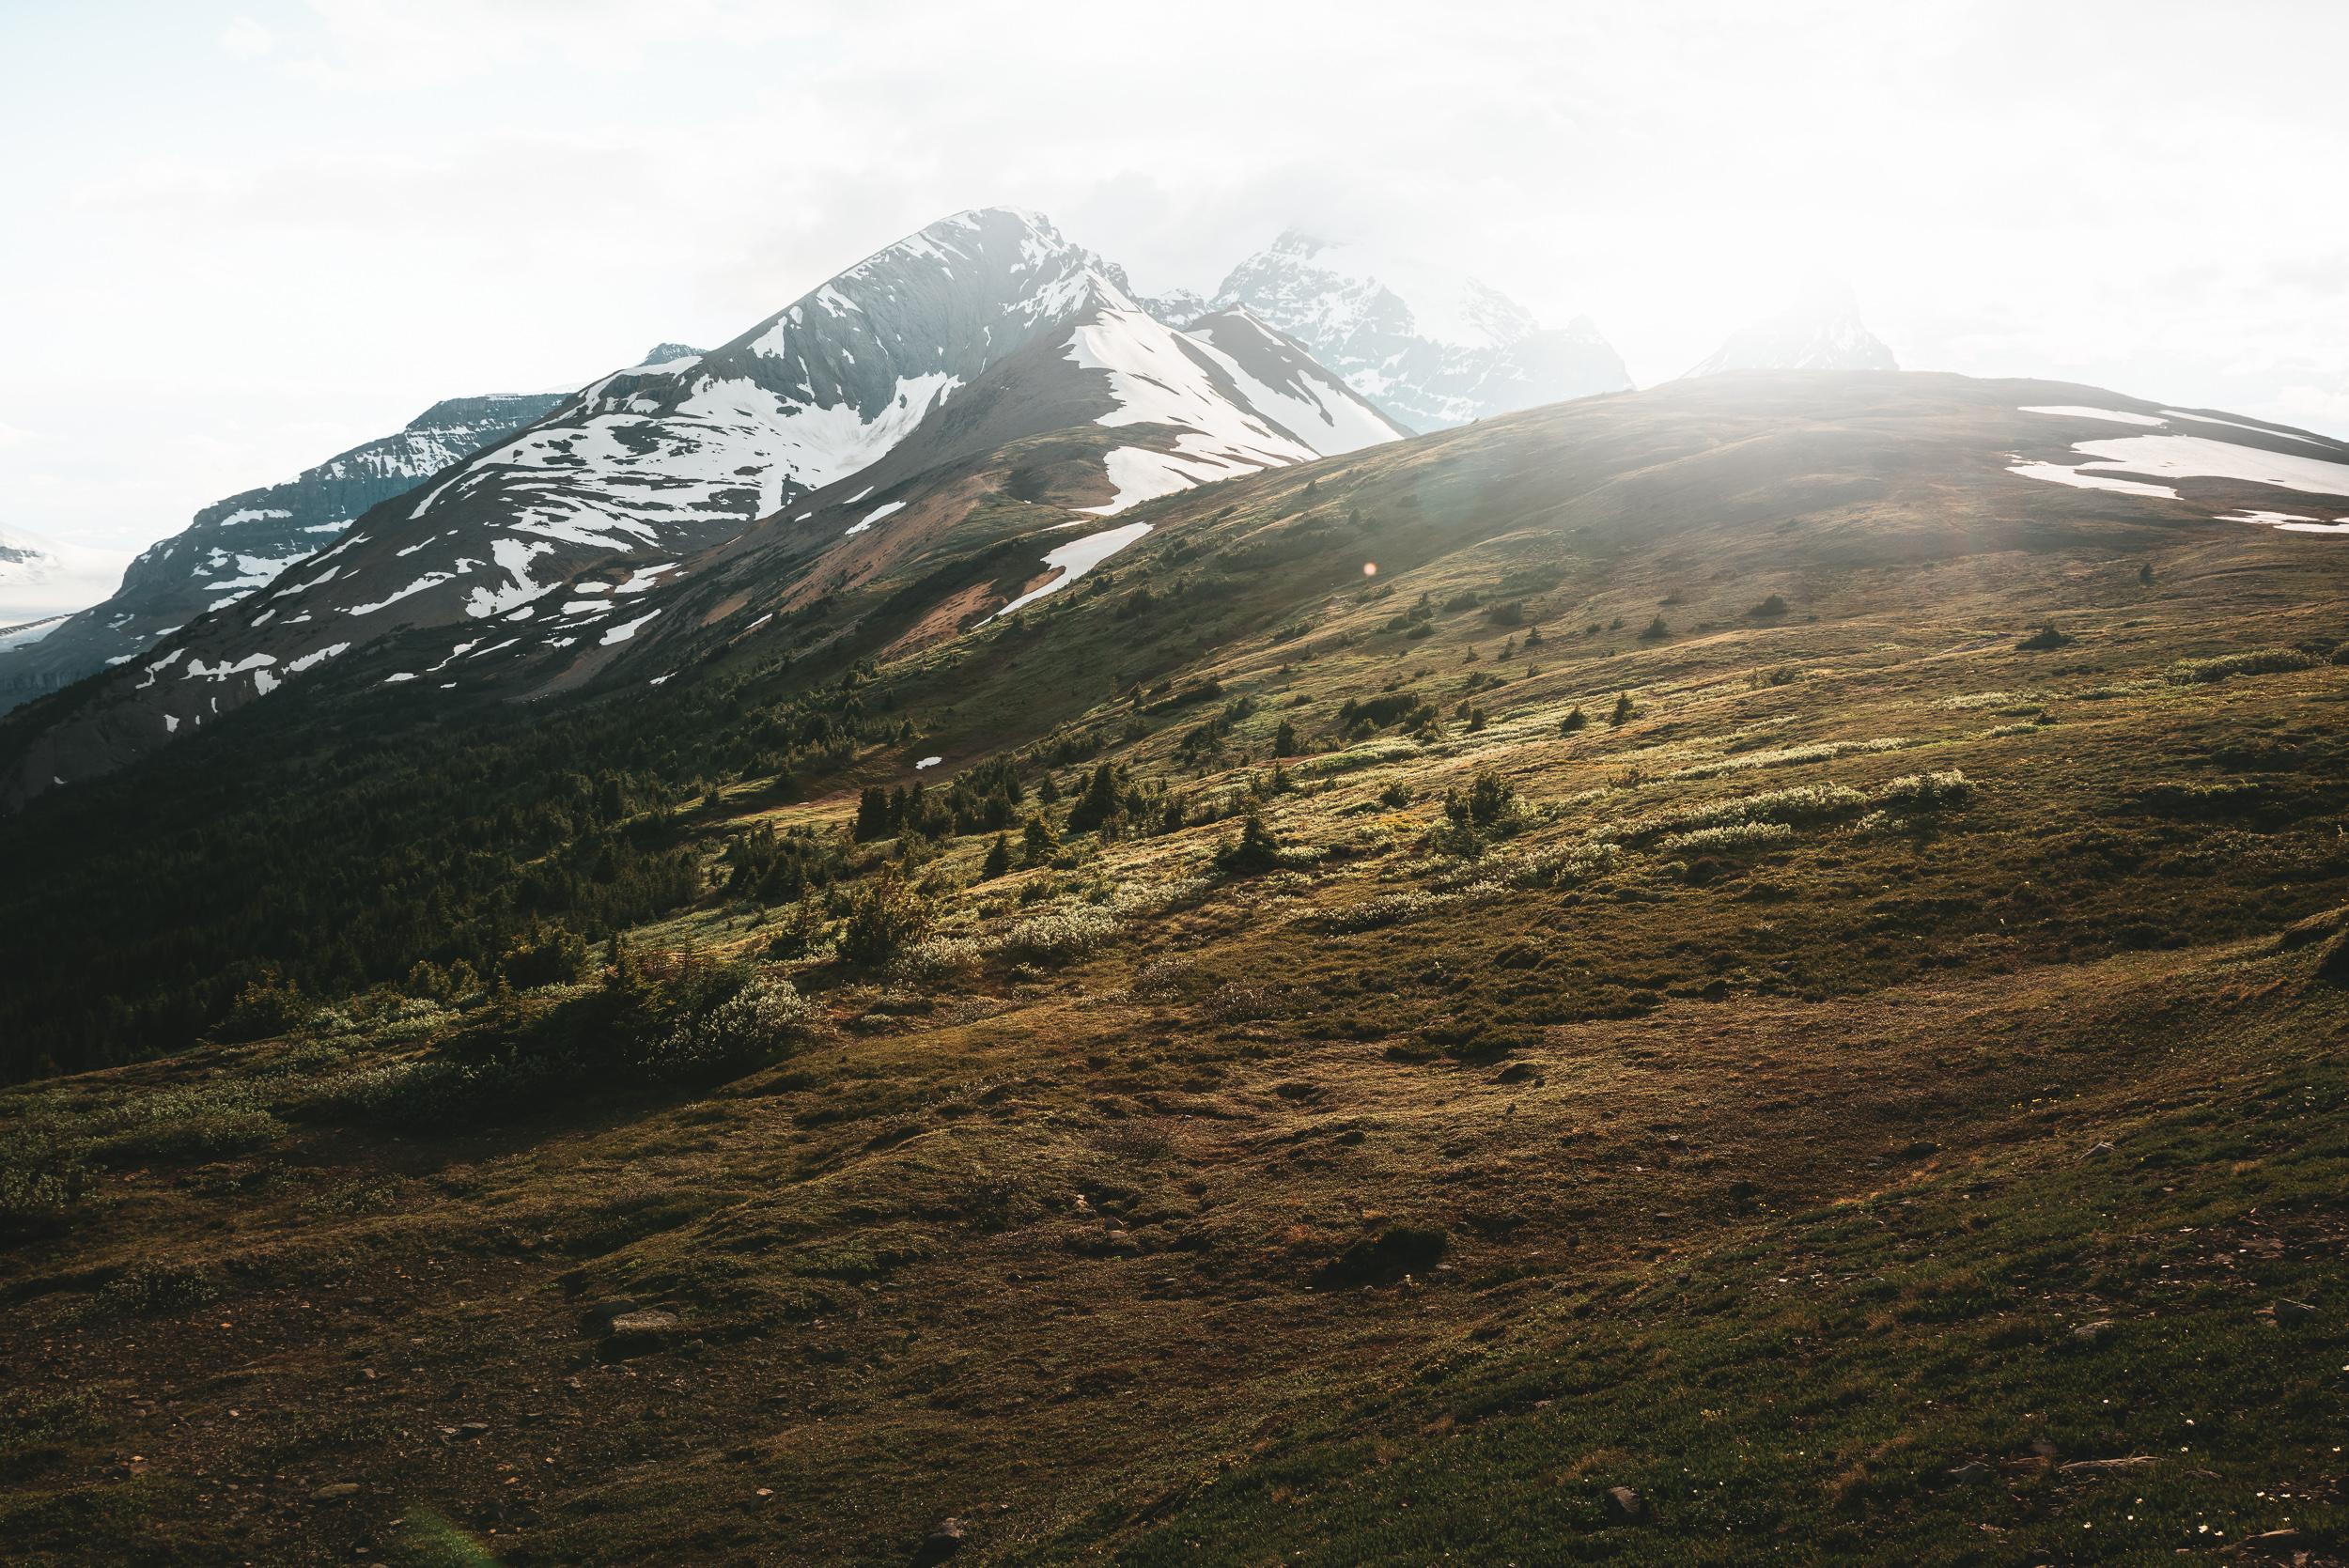 Mount Athabasca & Hilda Peak